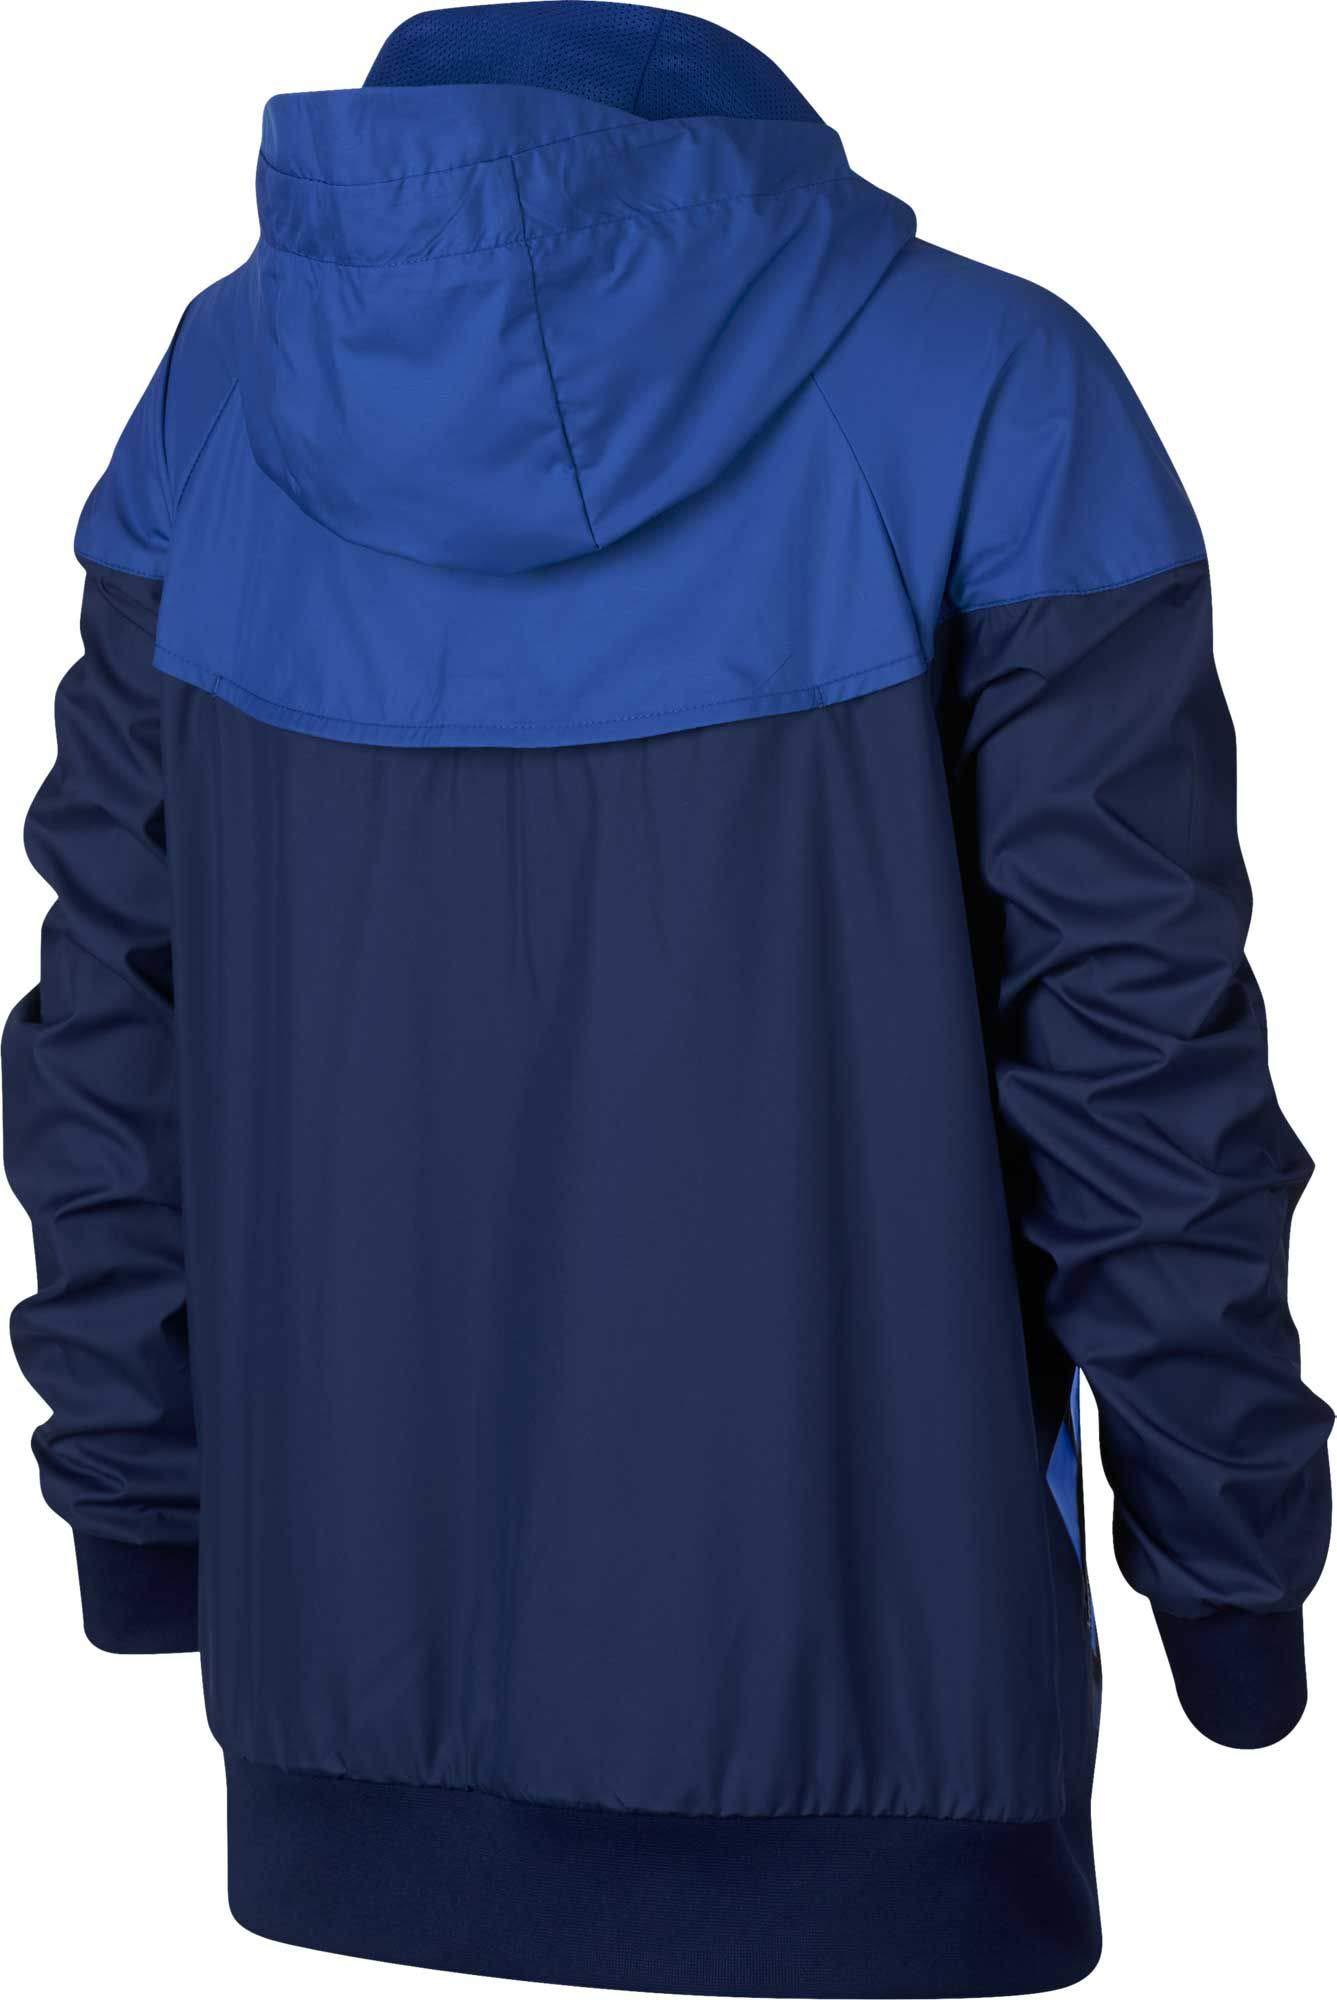 Nike Boy's Sportswear Graphic Windrunner Jacket (Blue, Small) by Nike (Image #2)